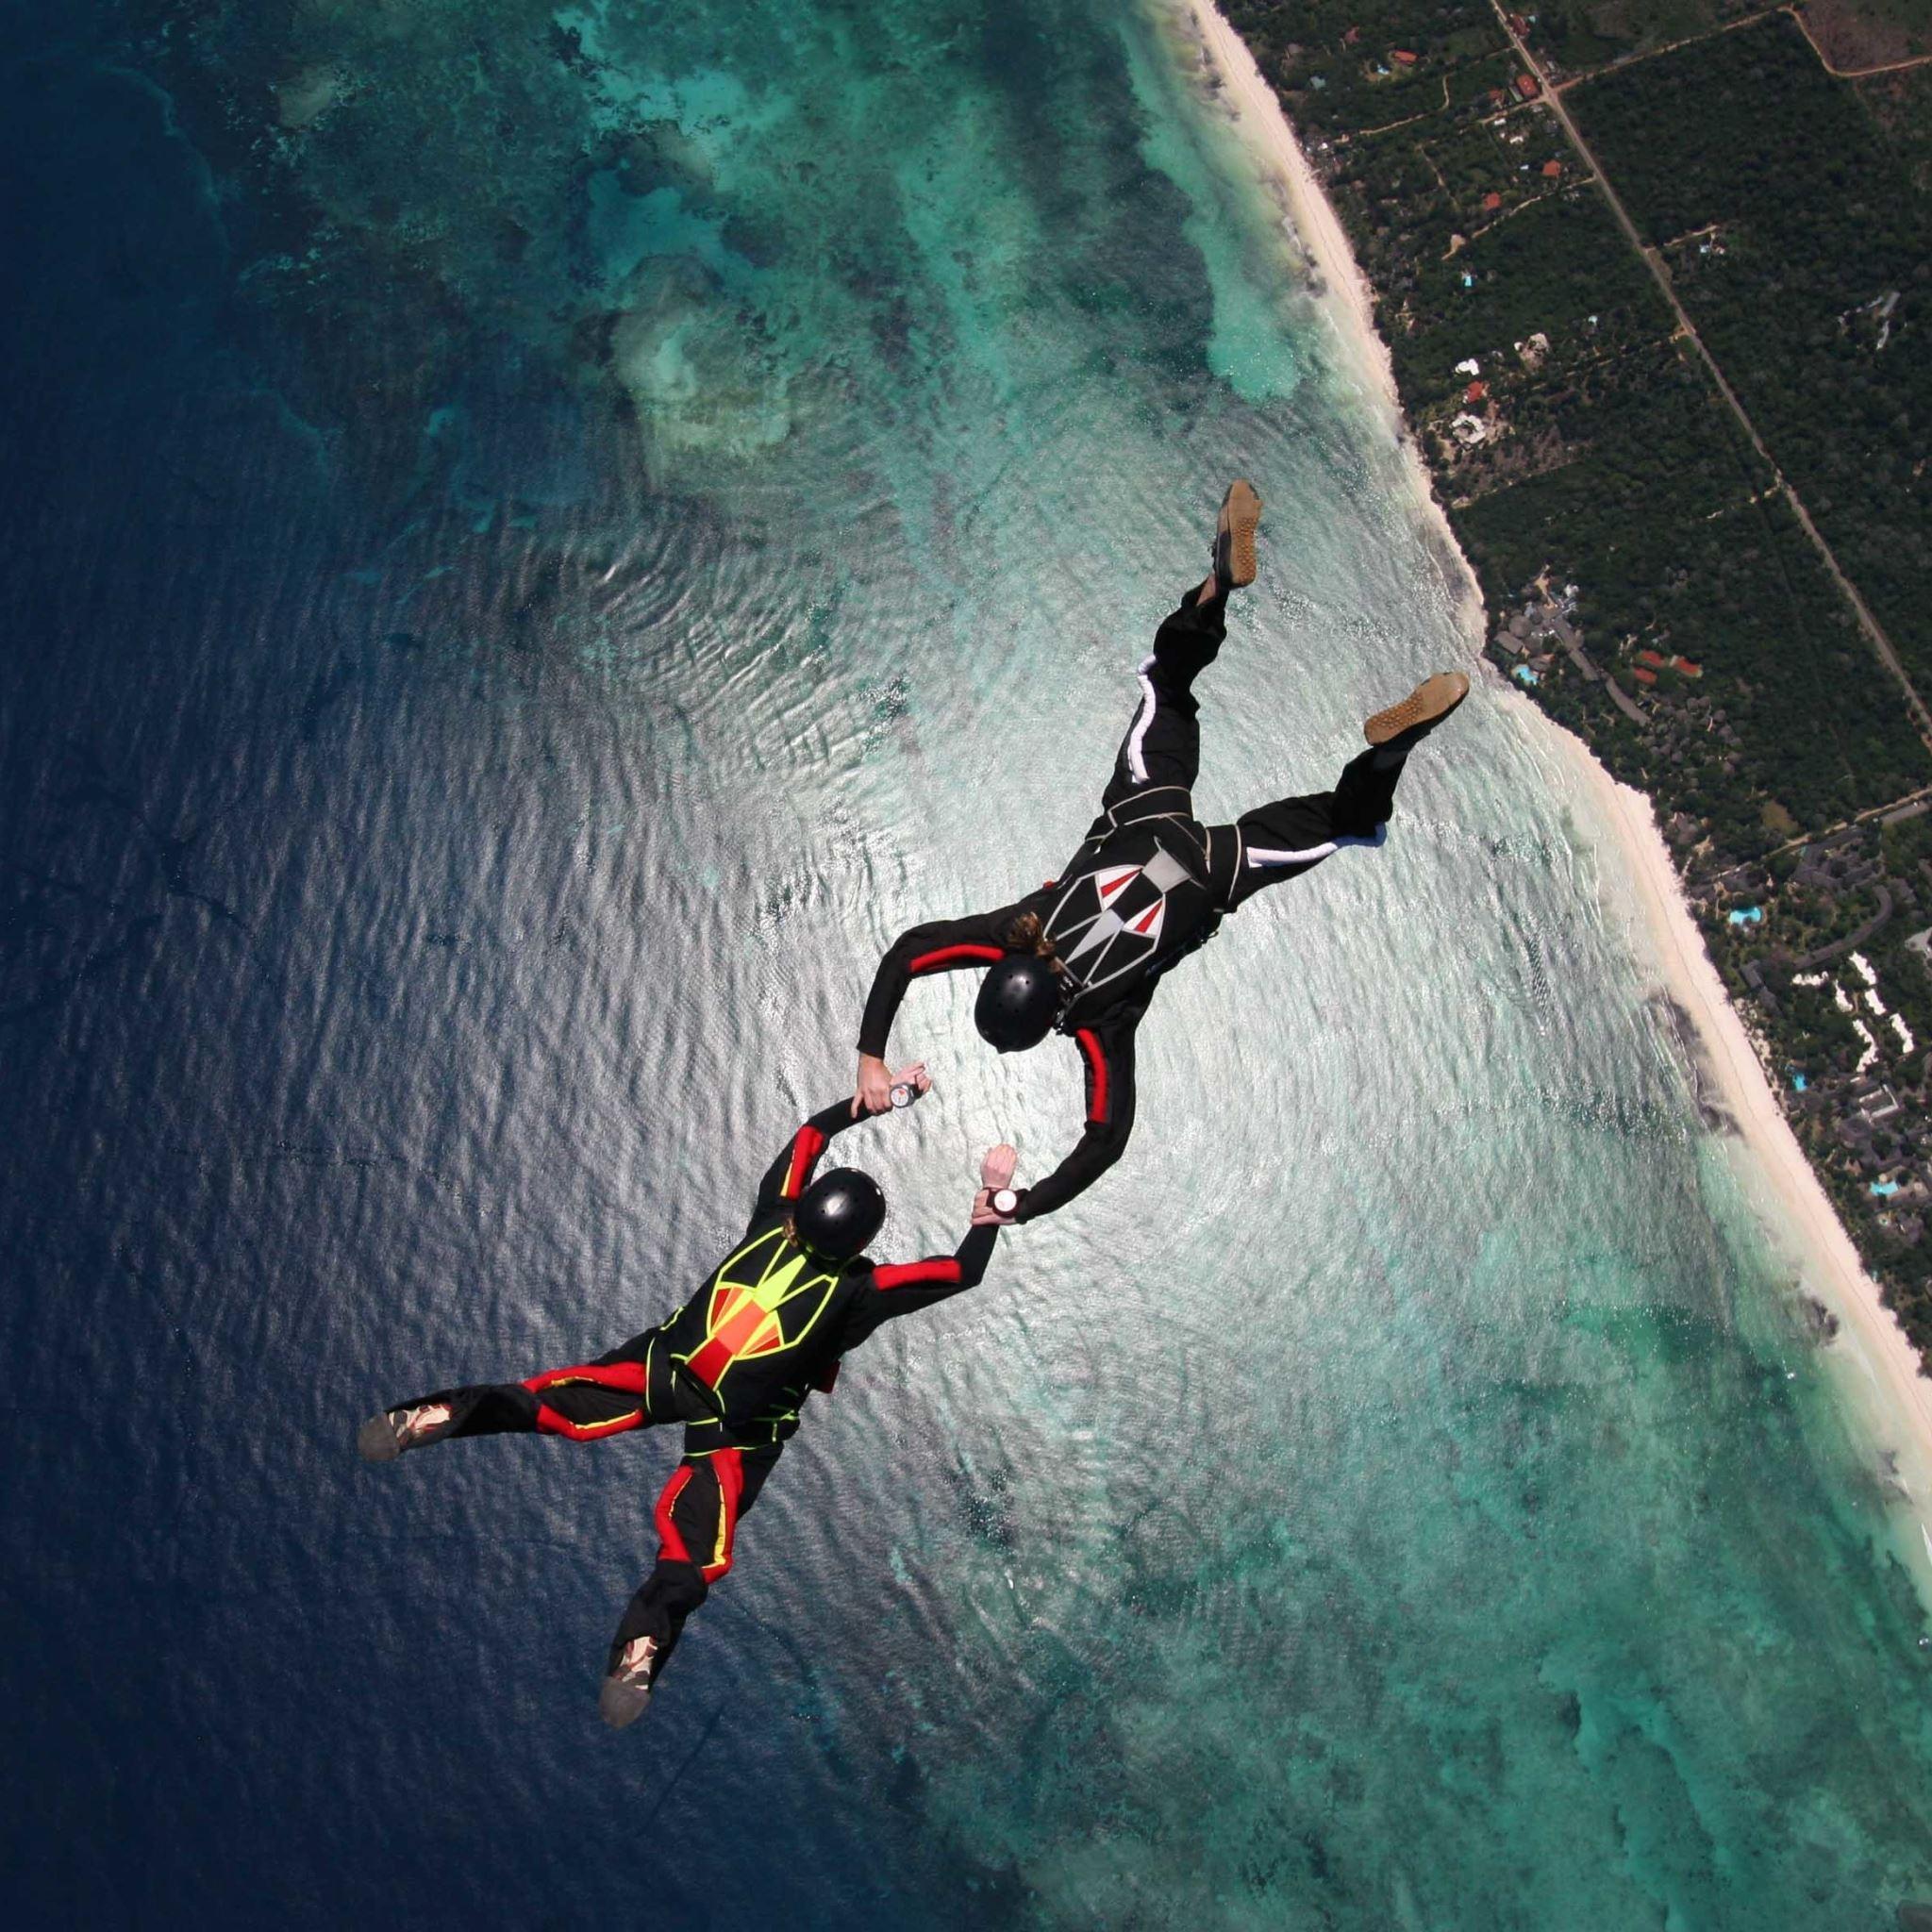 Skydivers Parachuting Stunt iPad Air wallpaper